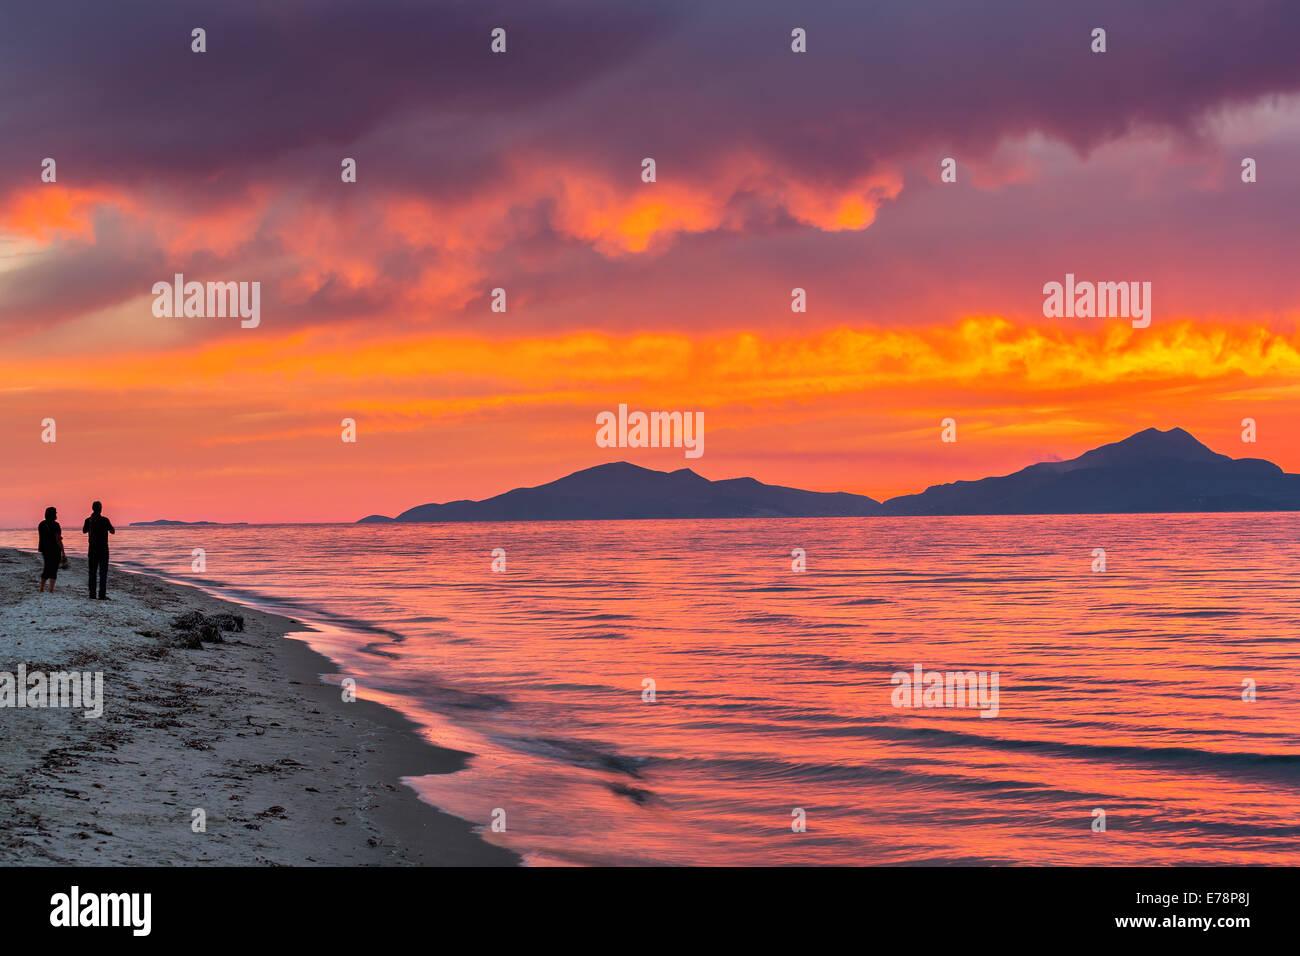 Sonnenuntergang über Meer in Griechenland Stockbild